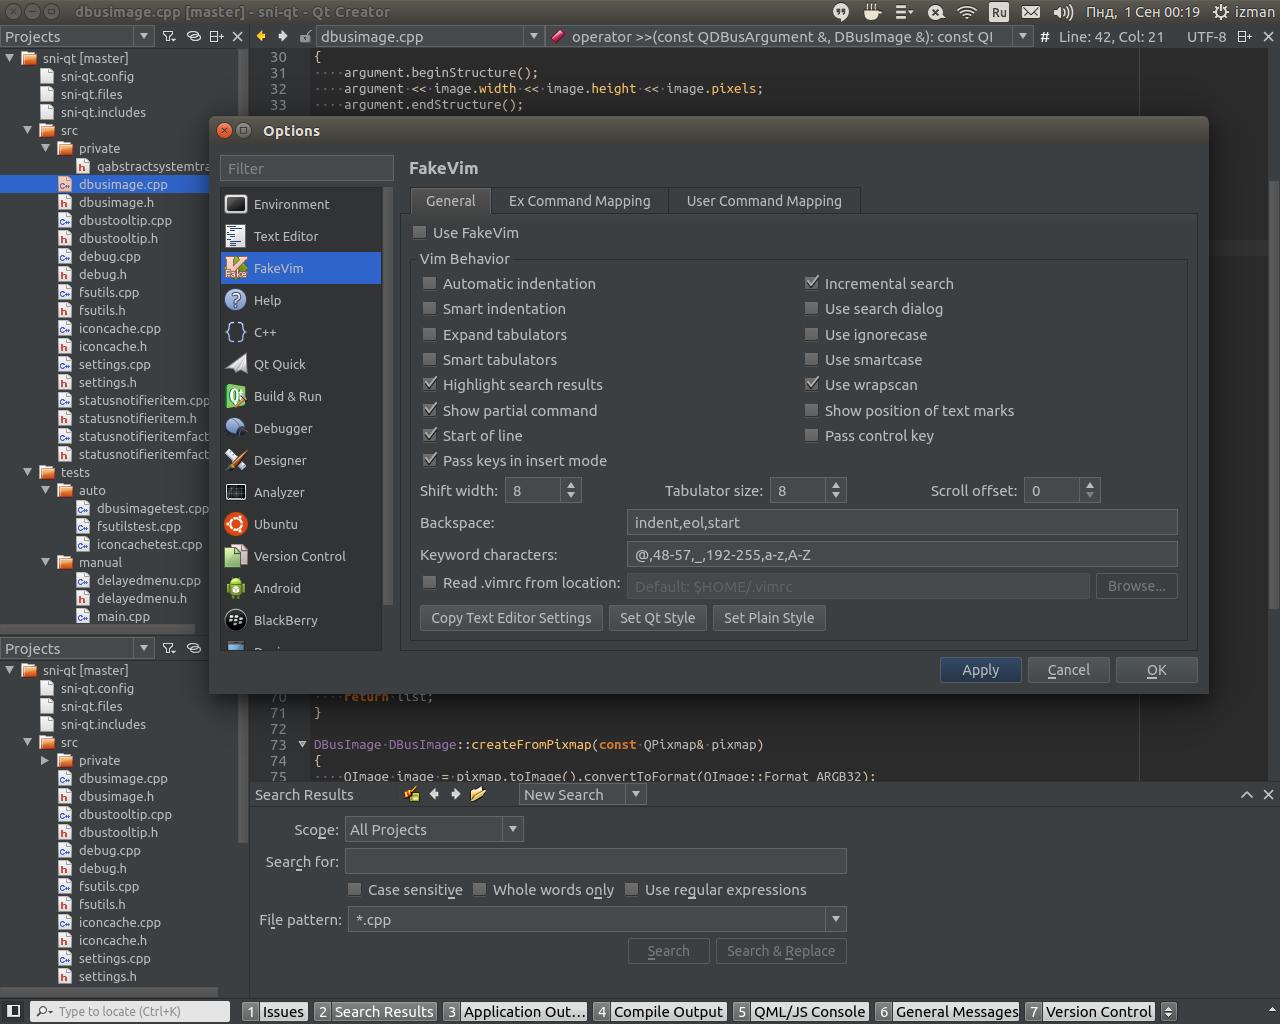 Options Dialog - Screenshot